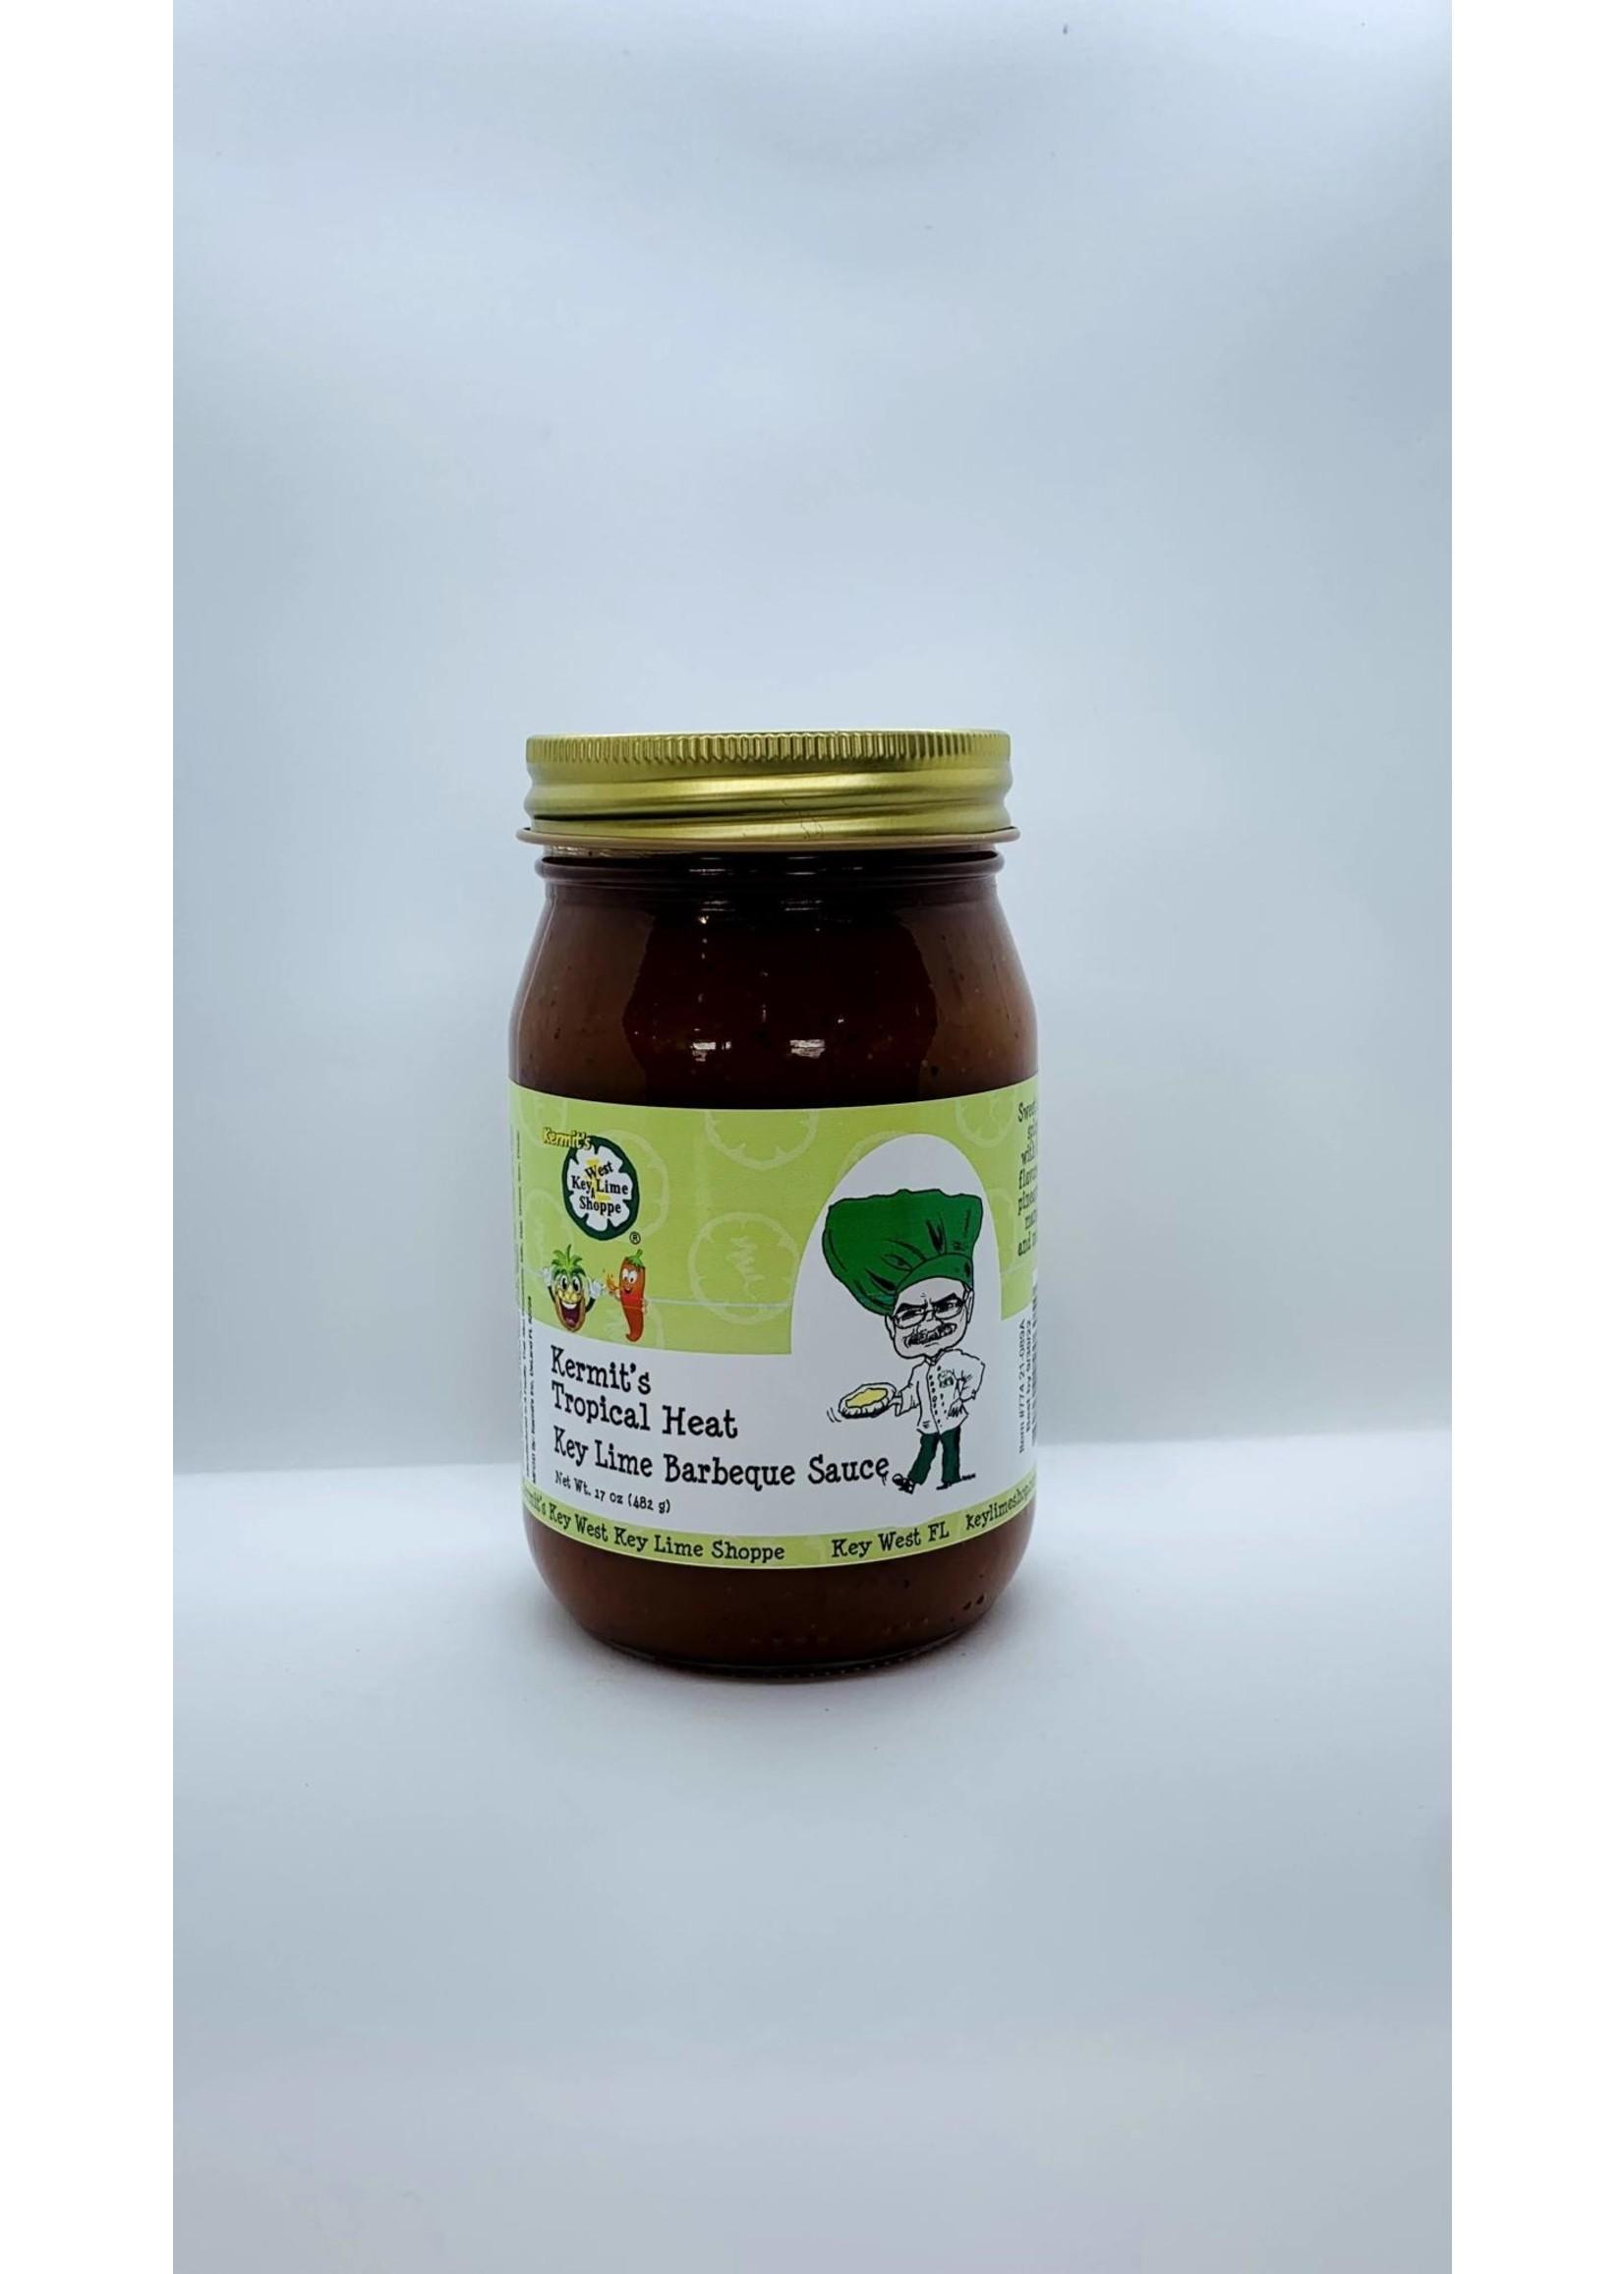 Kermit's Tropical Heat Key Lime Barbecue Sauce 17 oz.